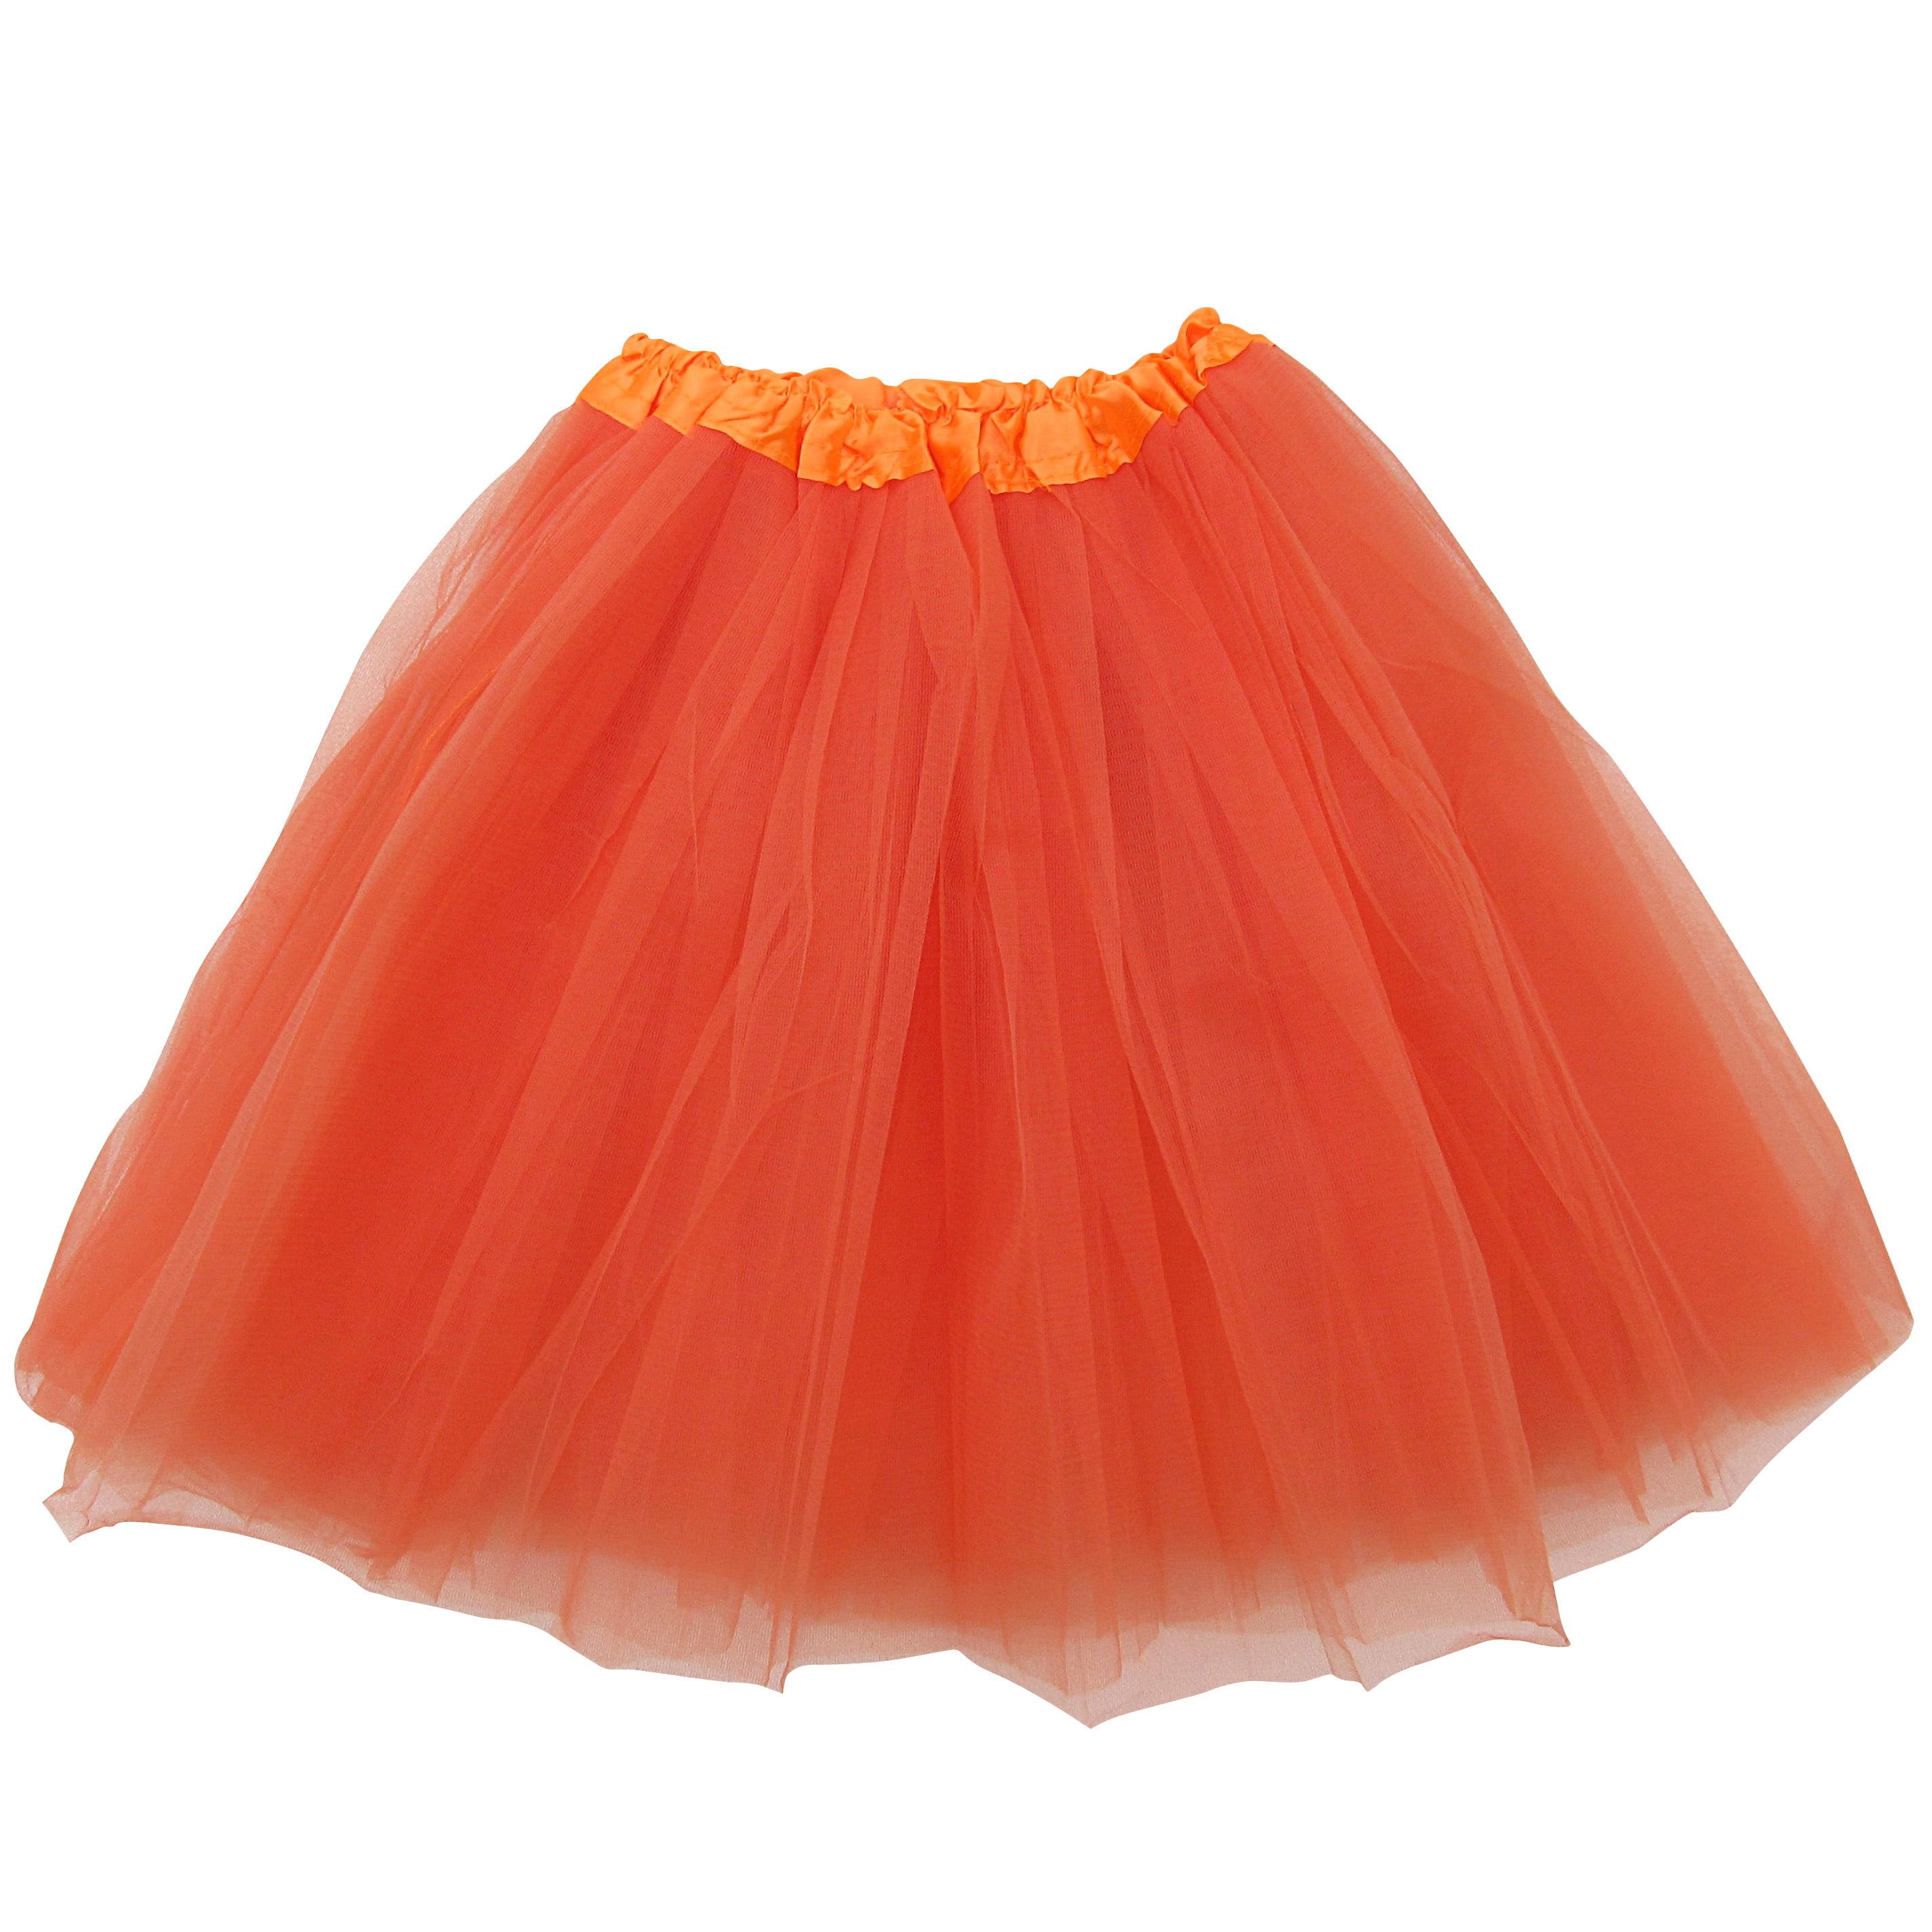 5539281d7 Plus Size Orange Adult Size 3-Layer Tulle Tutu Skirt - Princess Halloween  Costume, Ballet Dress, Party Outfit, Warrior Dash/ 5K Run - Walmart.com